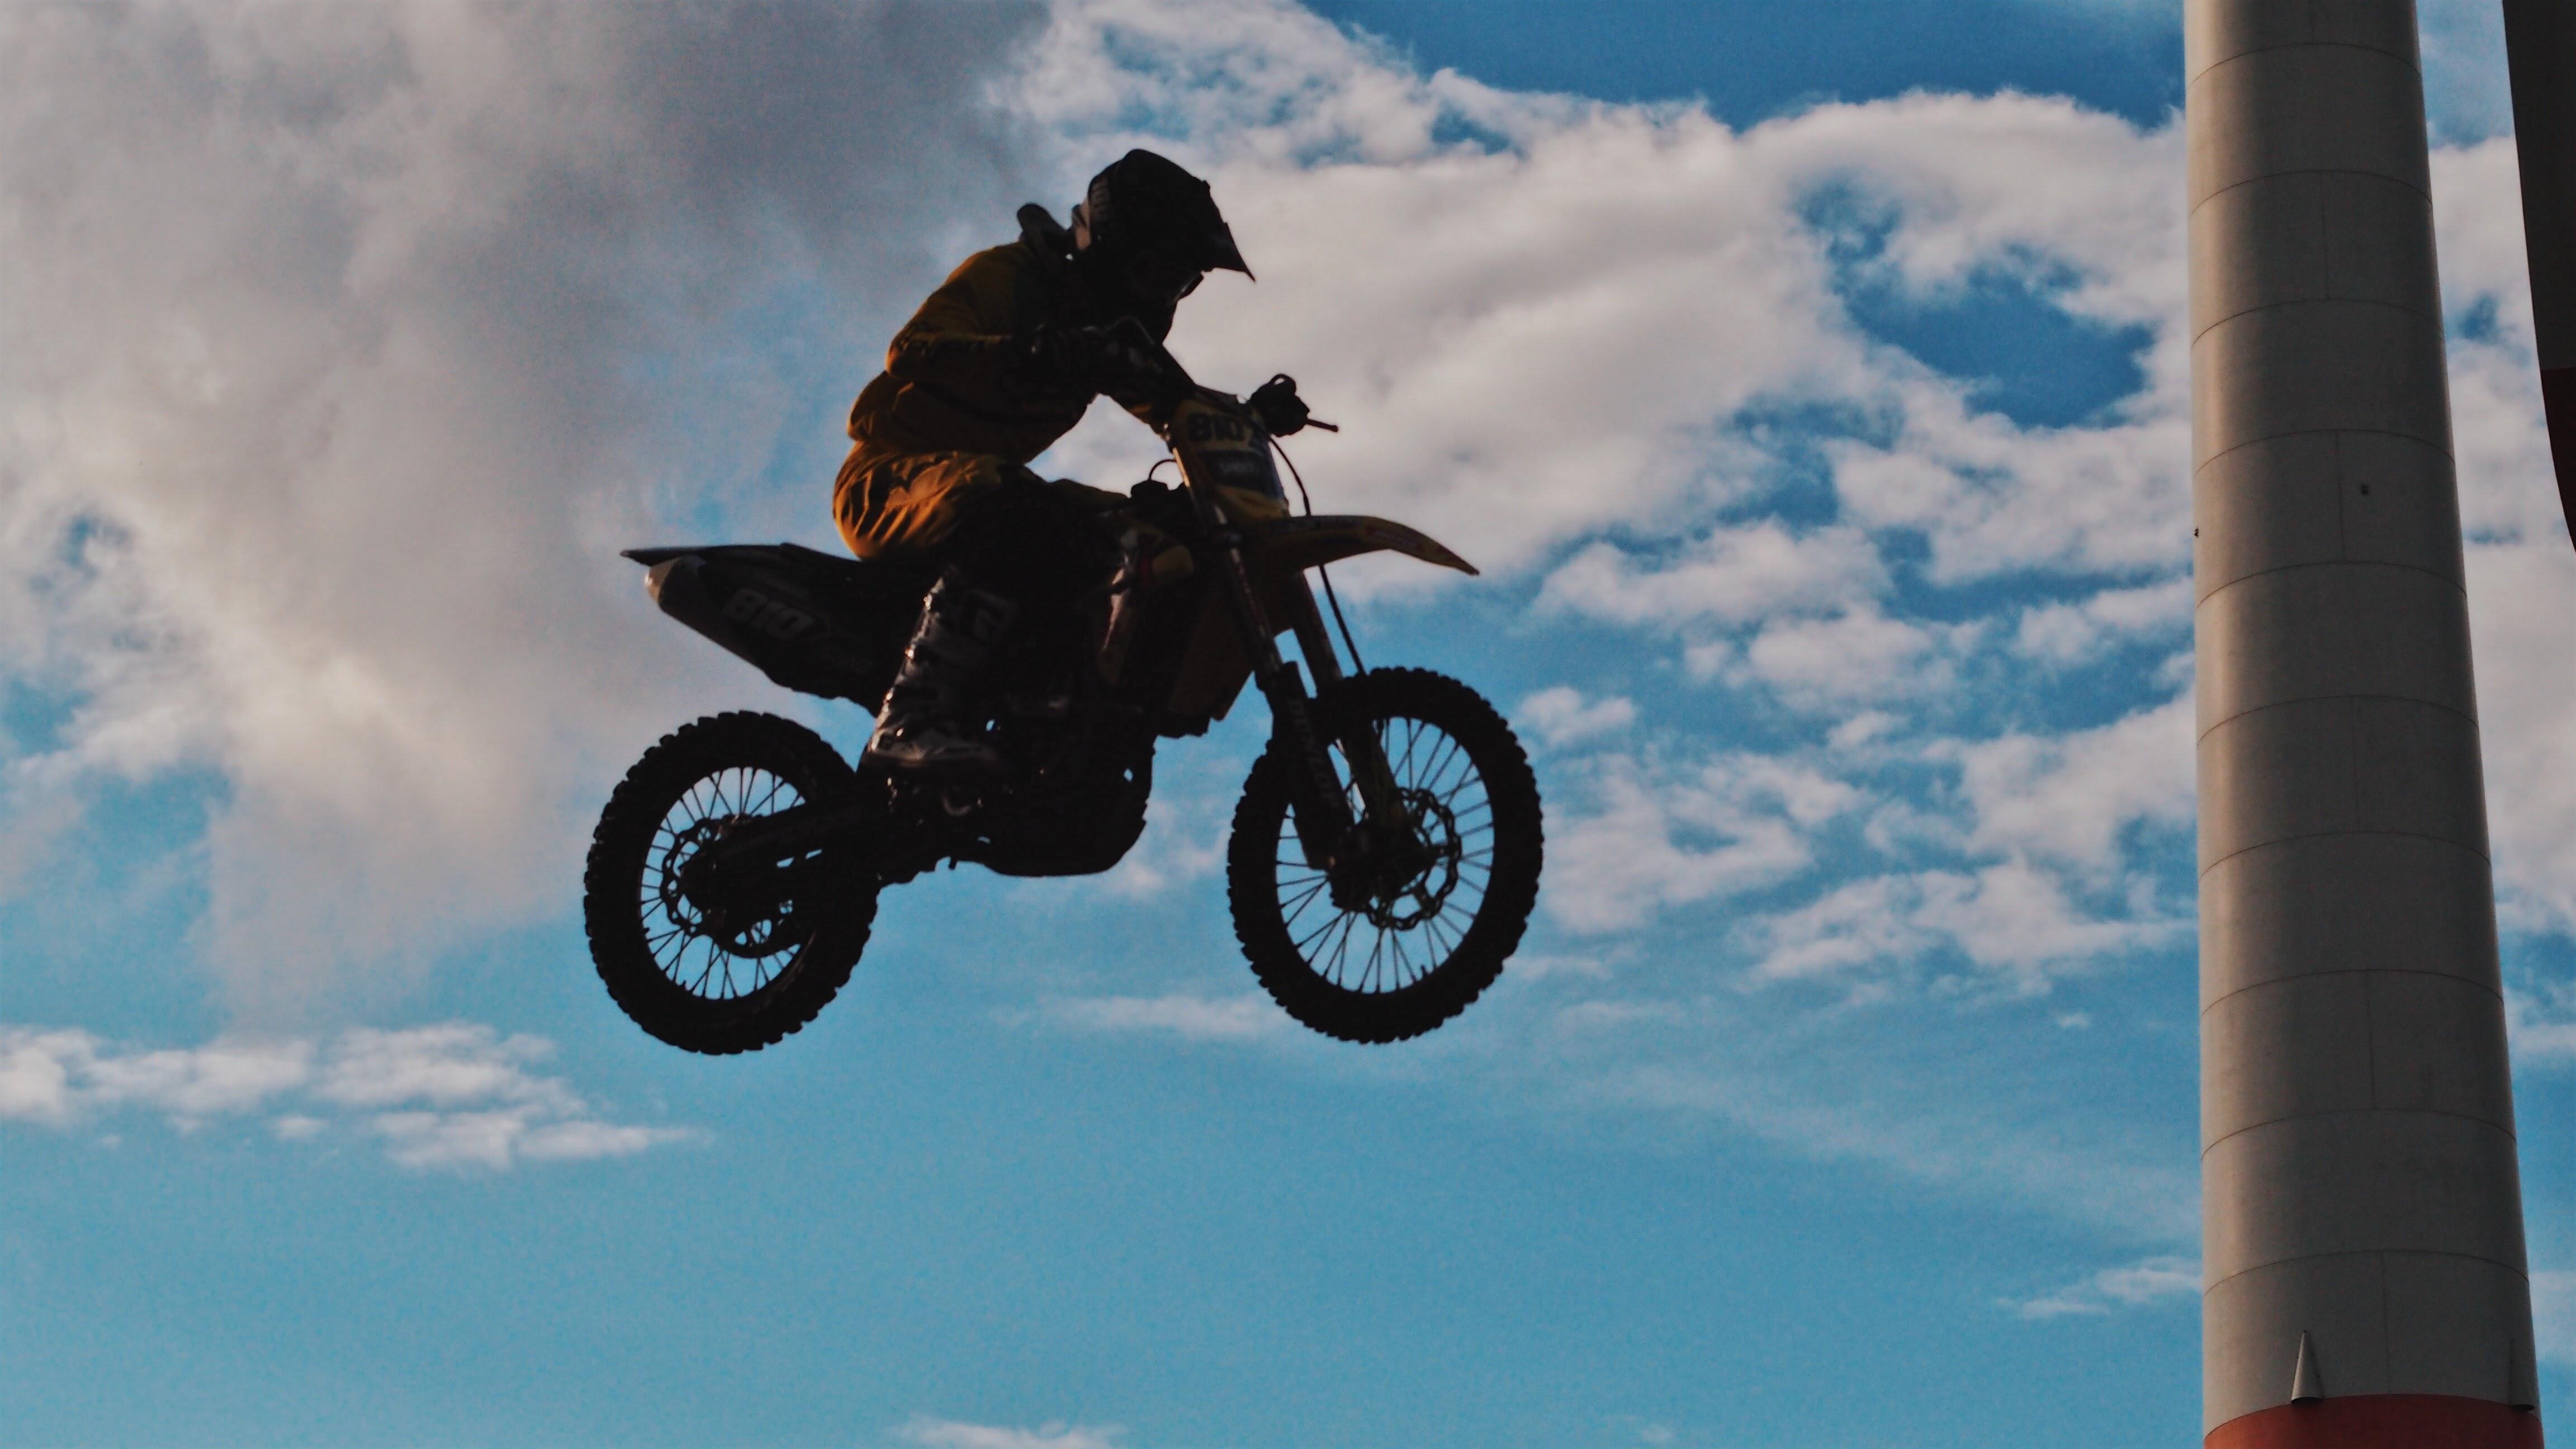 Man riding motocross dirt bike photo